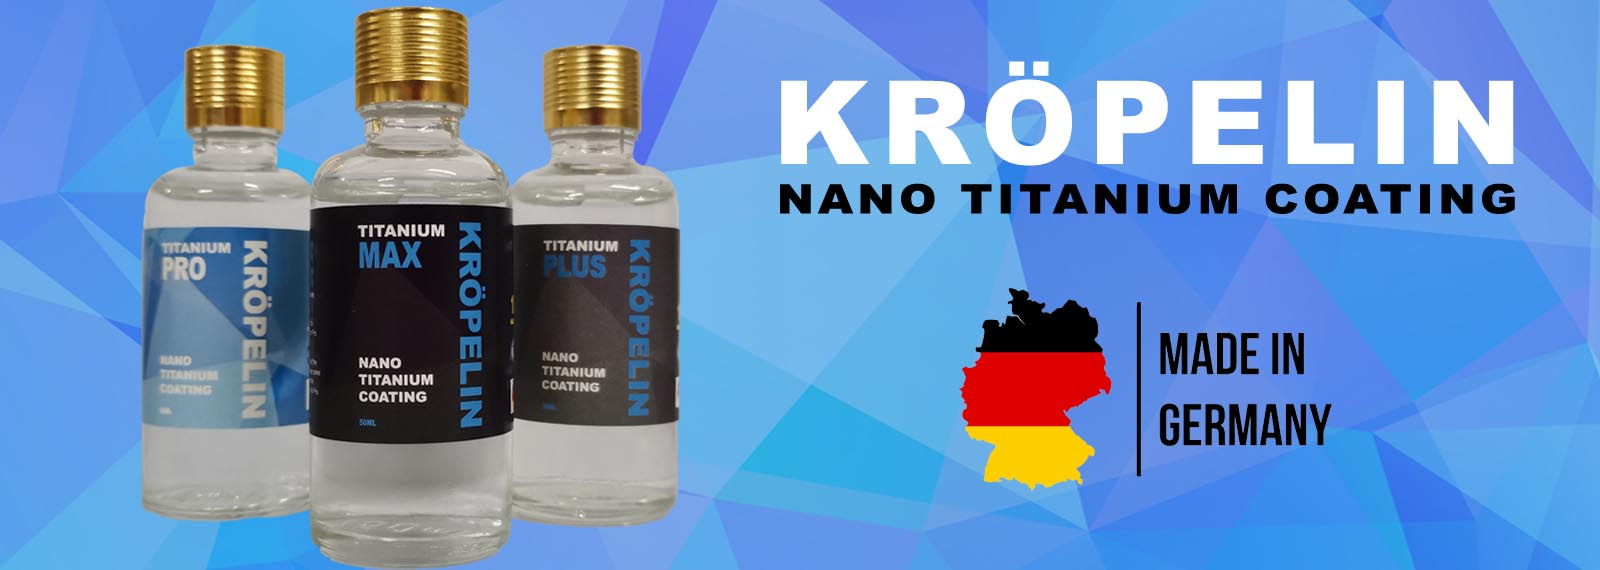 KROPELIN Nano-Titanium Car Coating